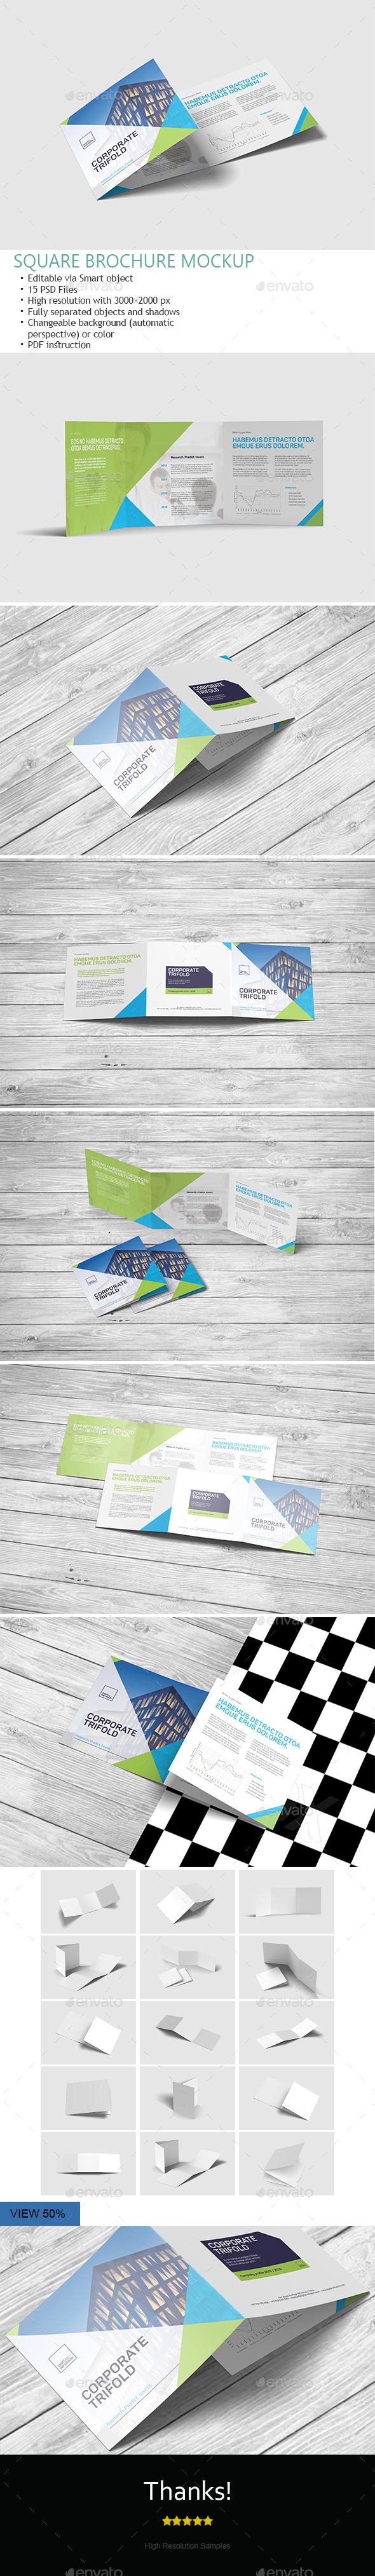 Square Trifold Brochure Mockups - Product Mock-Ups Graphics